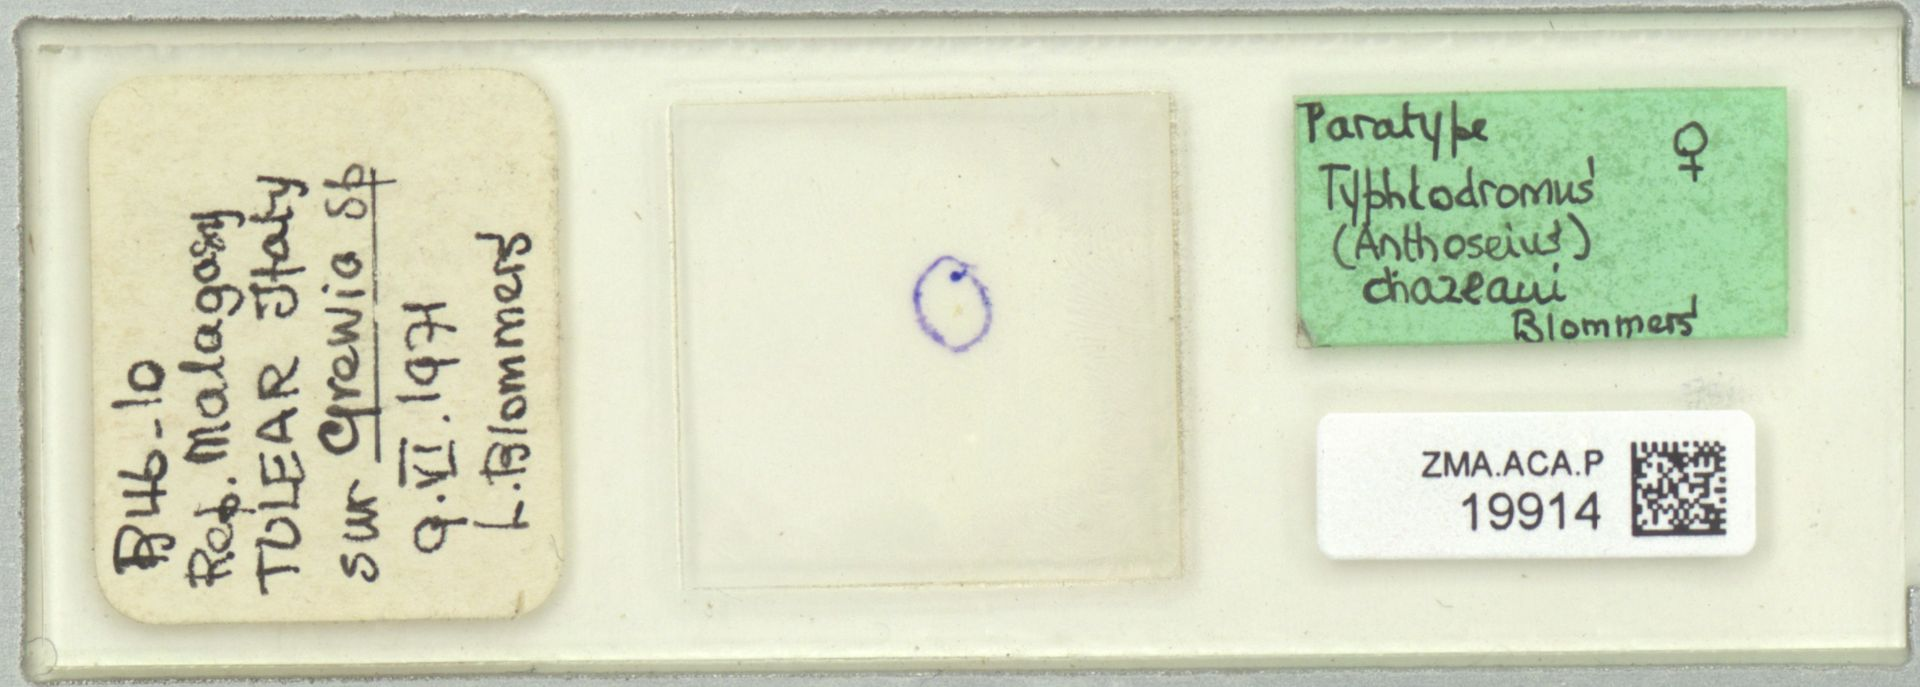 ZMA.ACA.P.19914 | Typhlodromus (Anthoseius) chazeaui